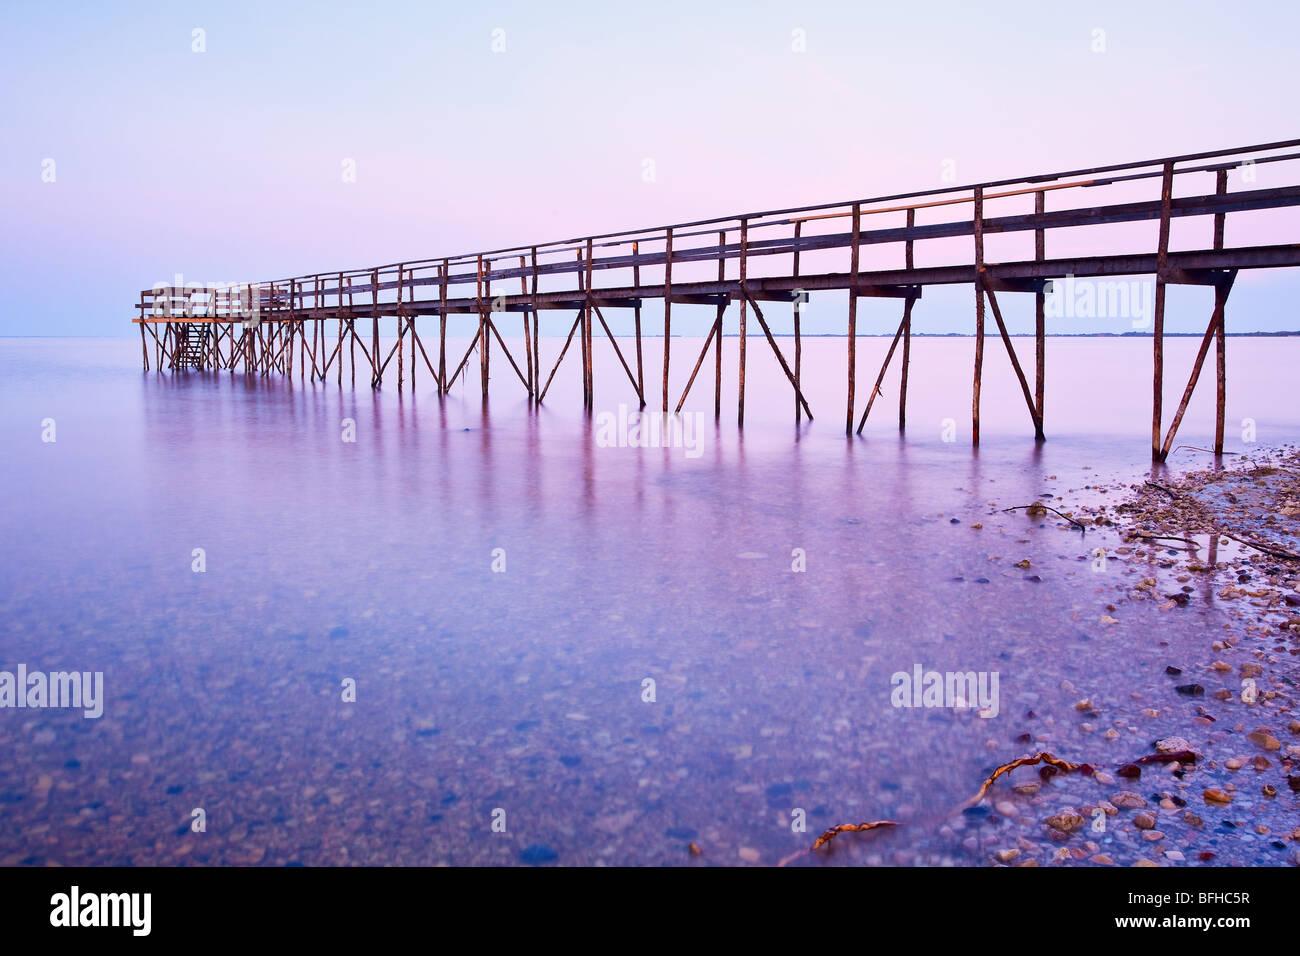 Wooden Pier on Lake Winnipeg at dusk.  Matlock, Manitoba, Canada. - Stock Image